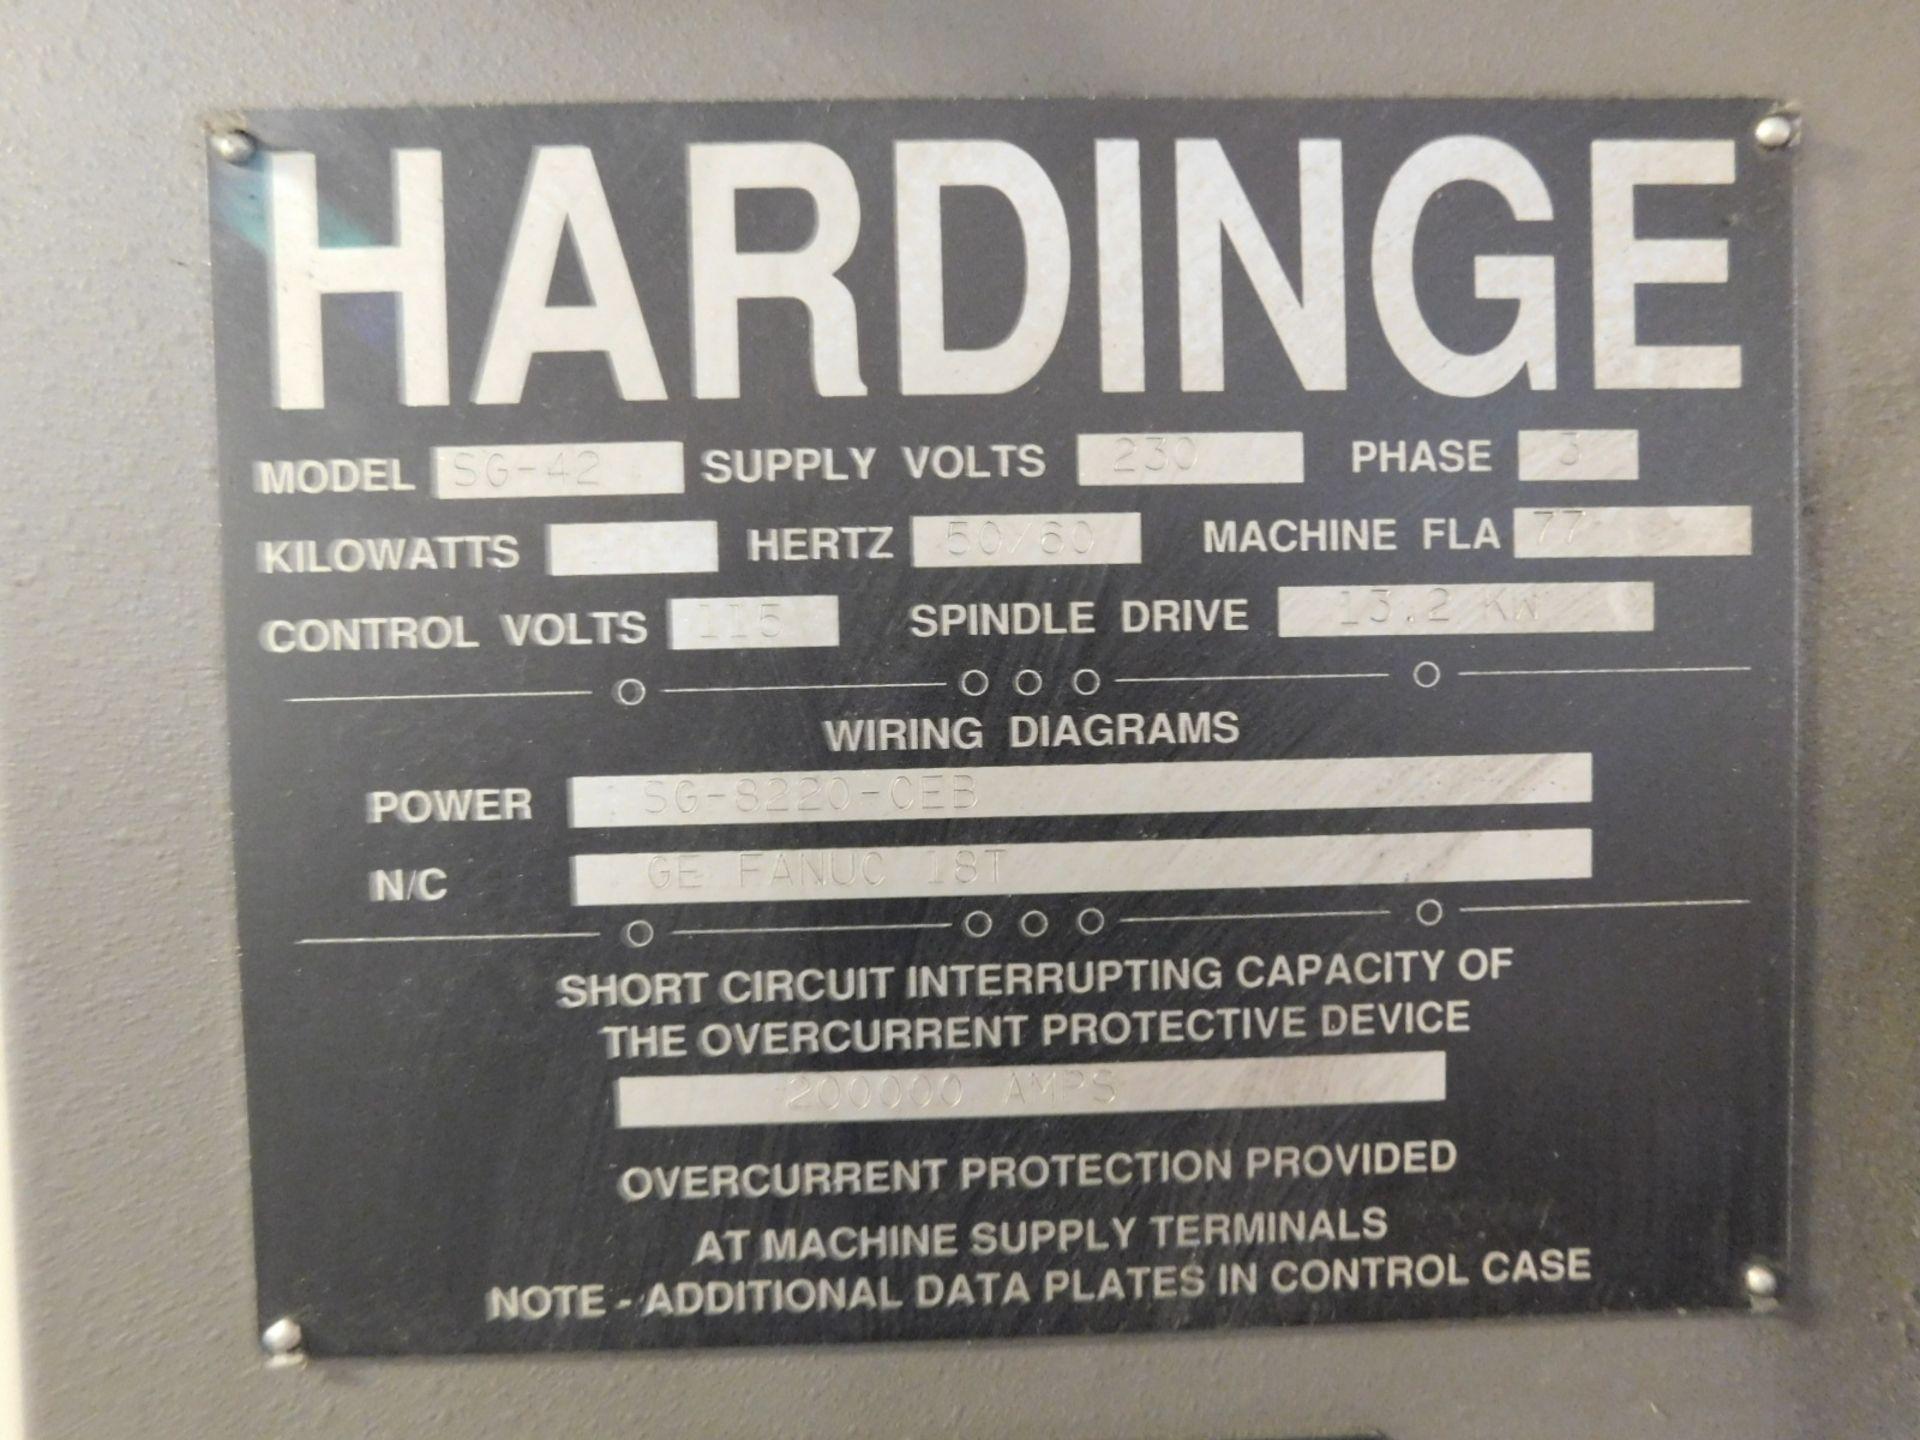 HARDINGE CONQUEST T-42 CNC LATHE, MODEL SG42, FANUC 18-T CNC CONTROL, 12-STATION TURRET, - Image 9 of 27